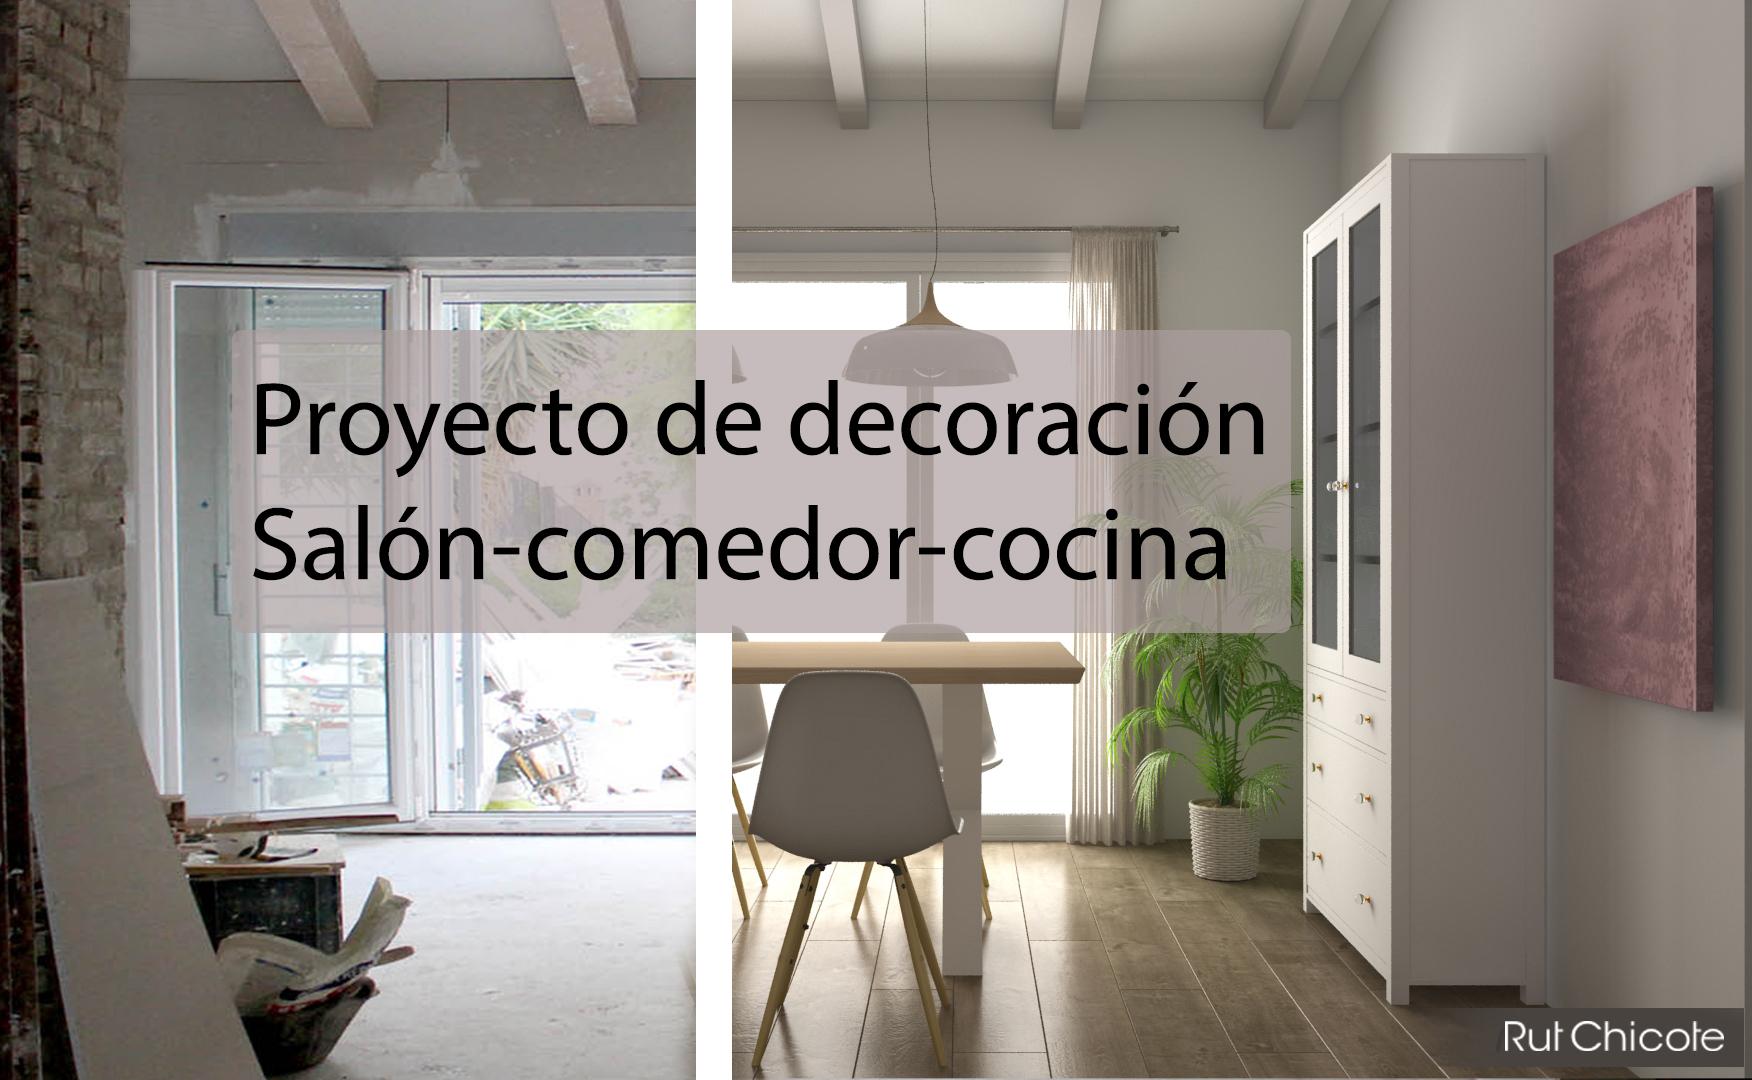 Proyecto de decoración; Salón-comedor-cocina - rutchicote